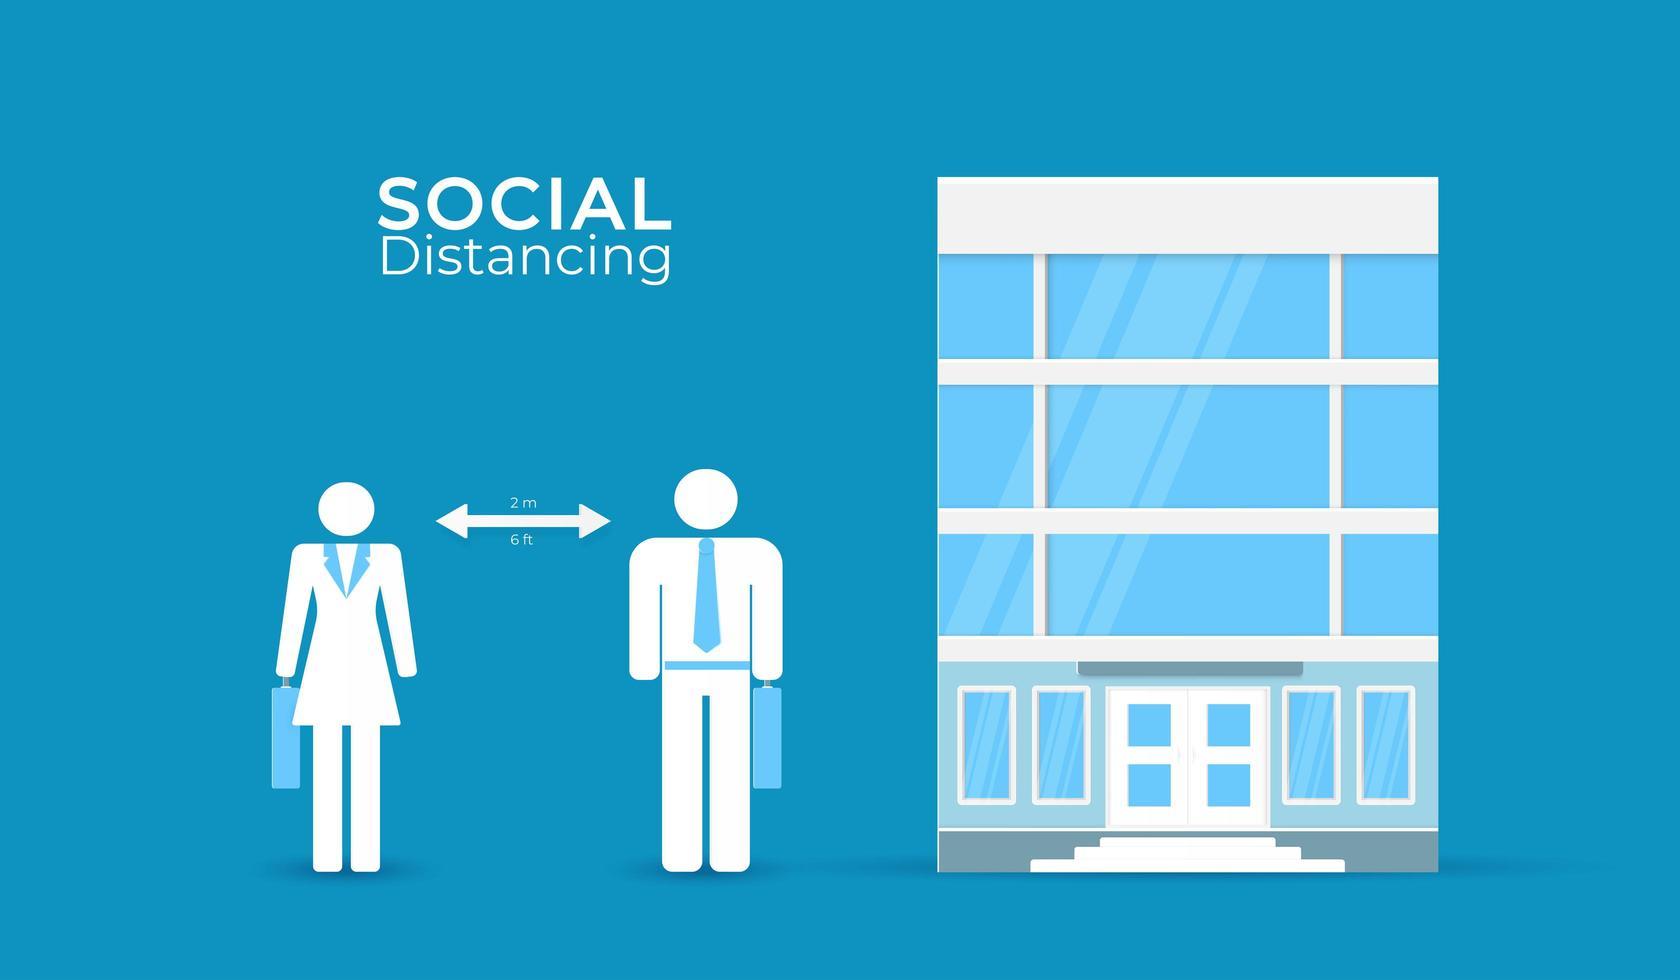 distanciamiento social en póster de oficina vector